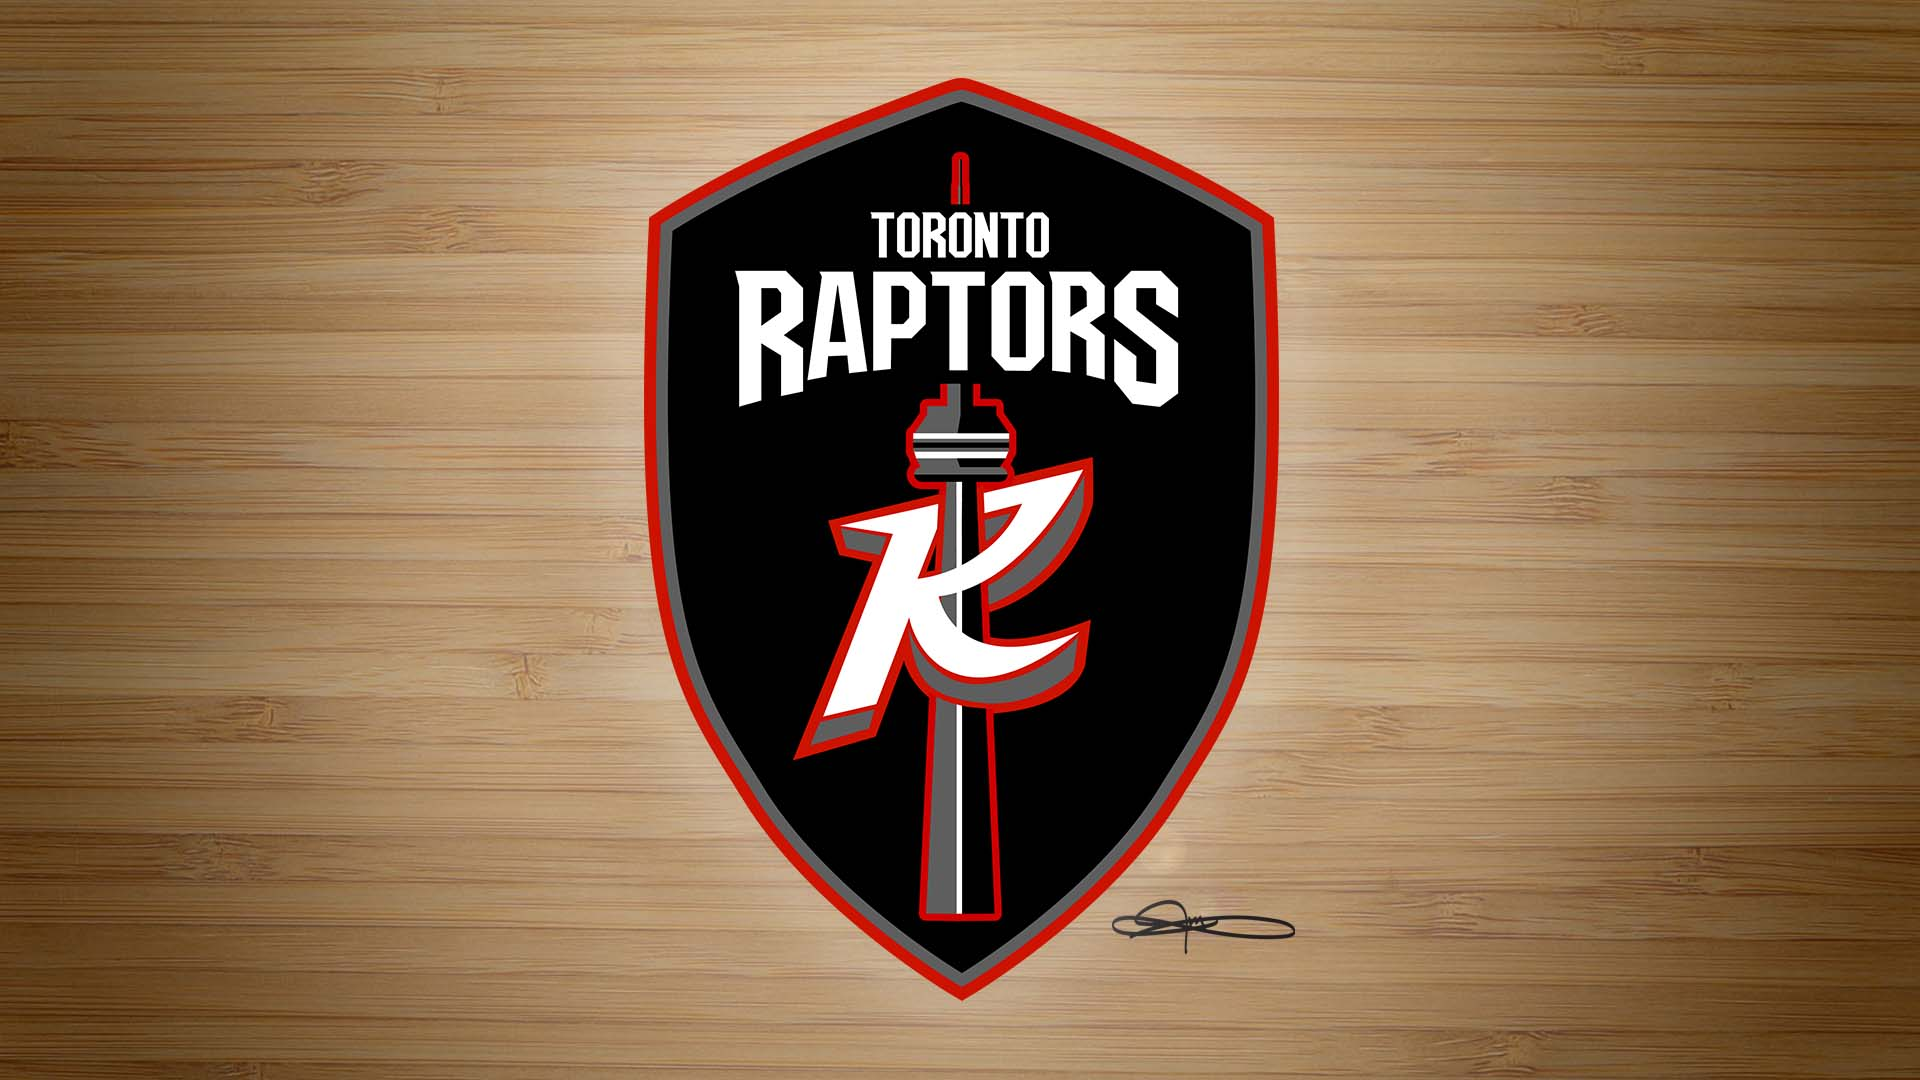 Raptors X Cavs (2017 update)